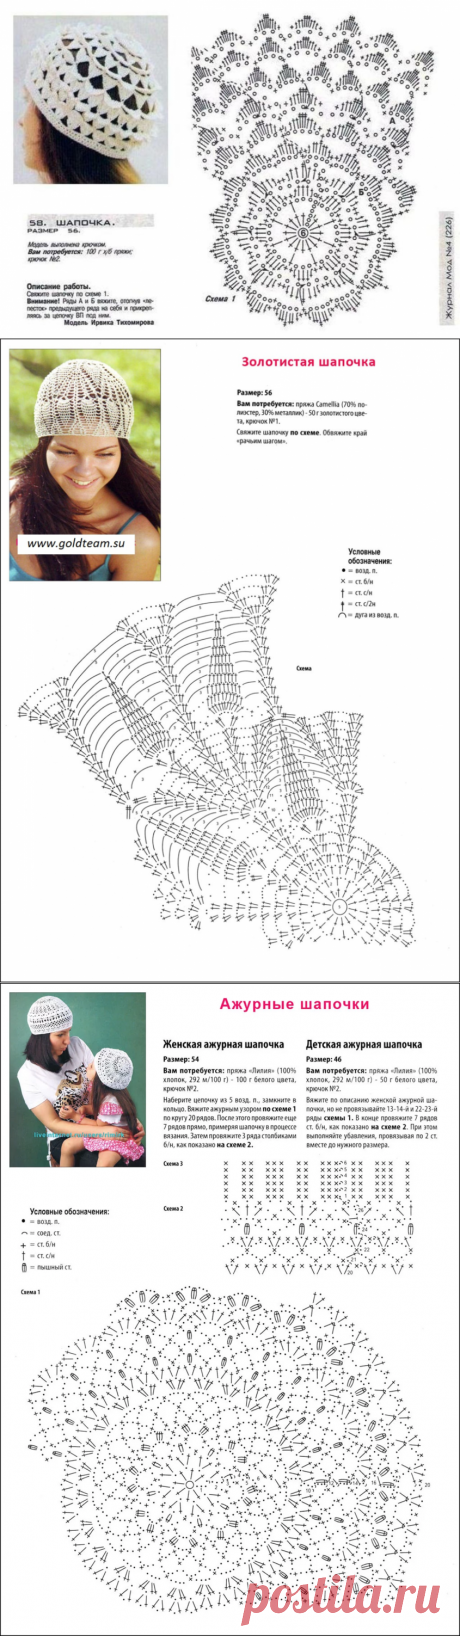 Вяжем панамки, шапочки и шляпки на лето, 30 схем крючком | Повязушки лайф | Яндекс Дзен